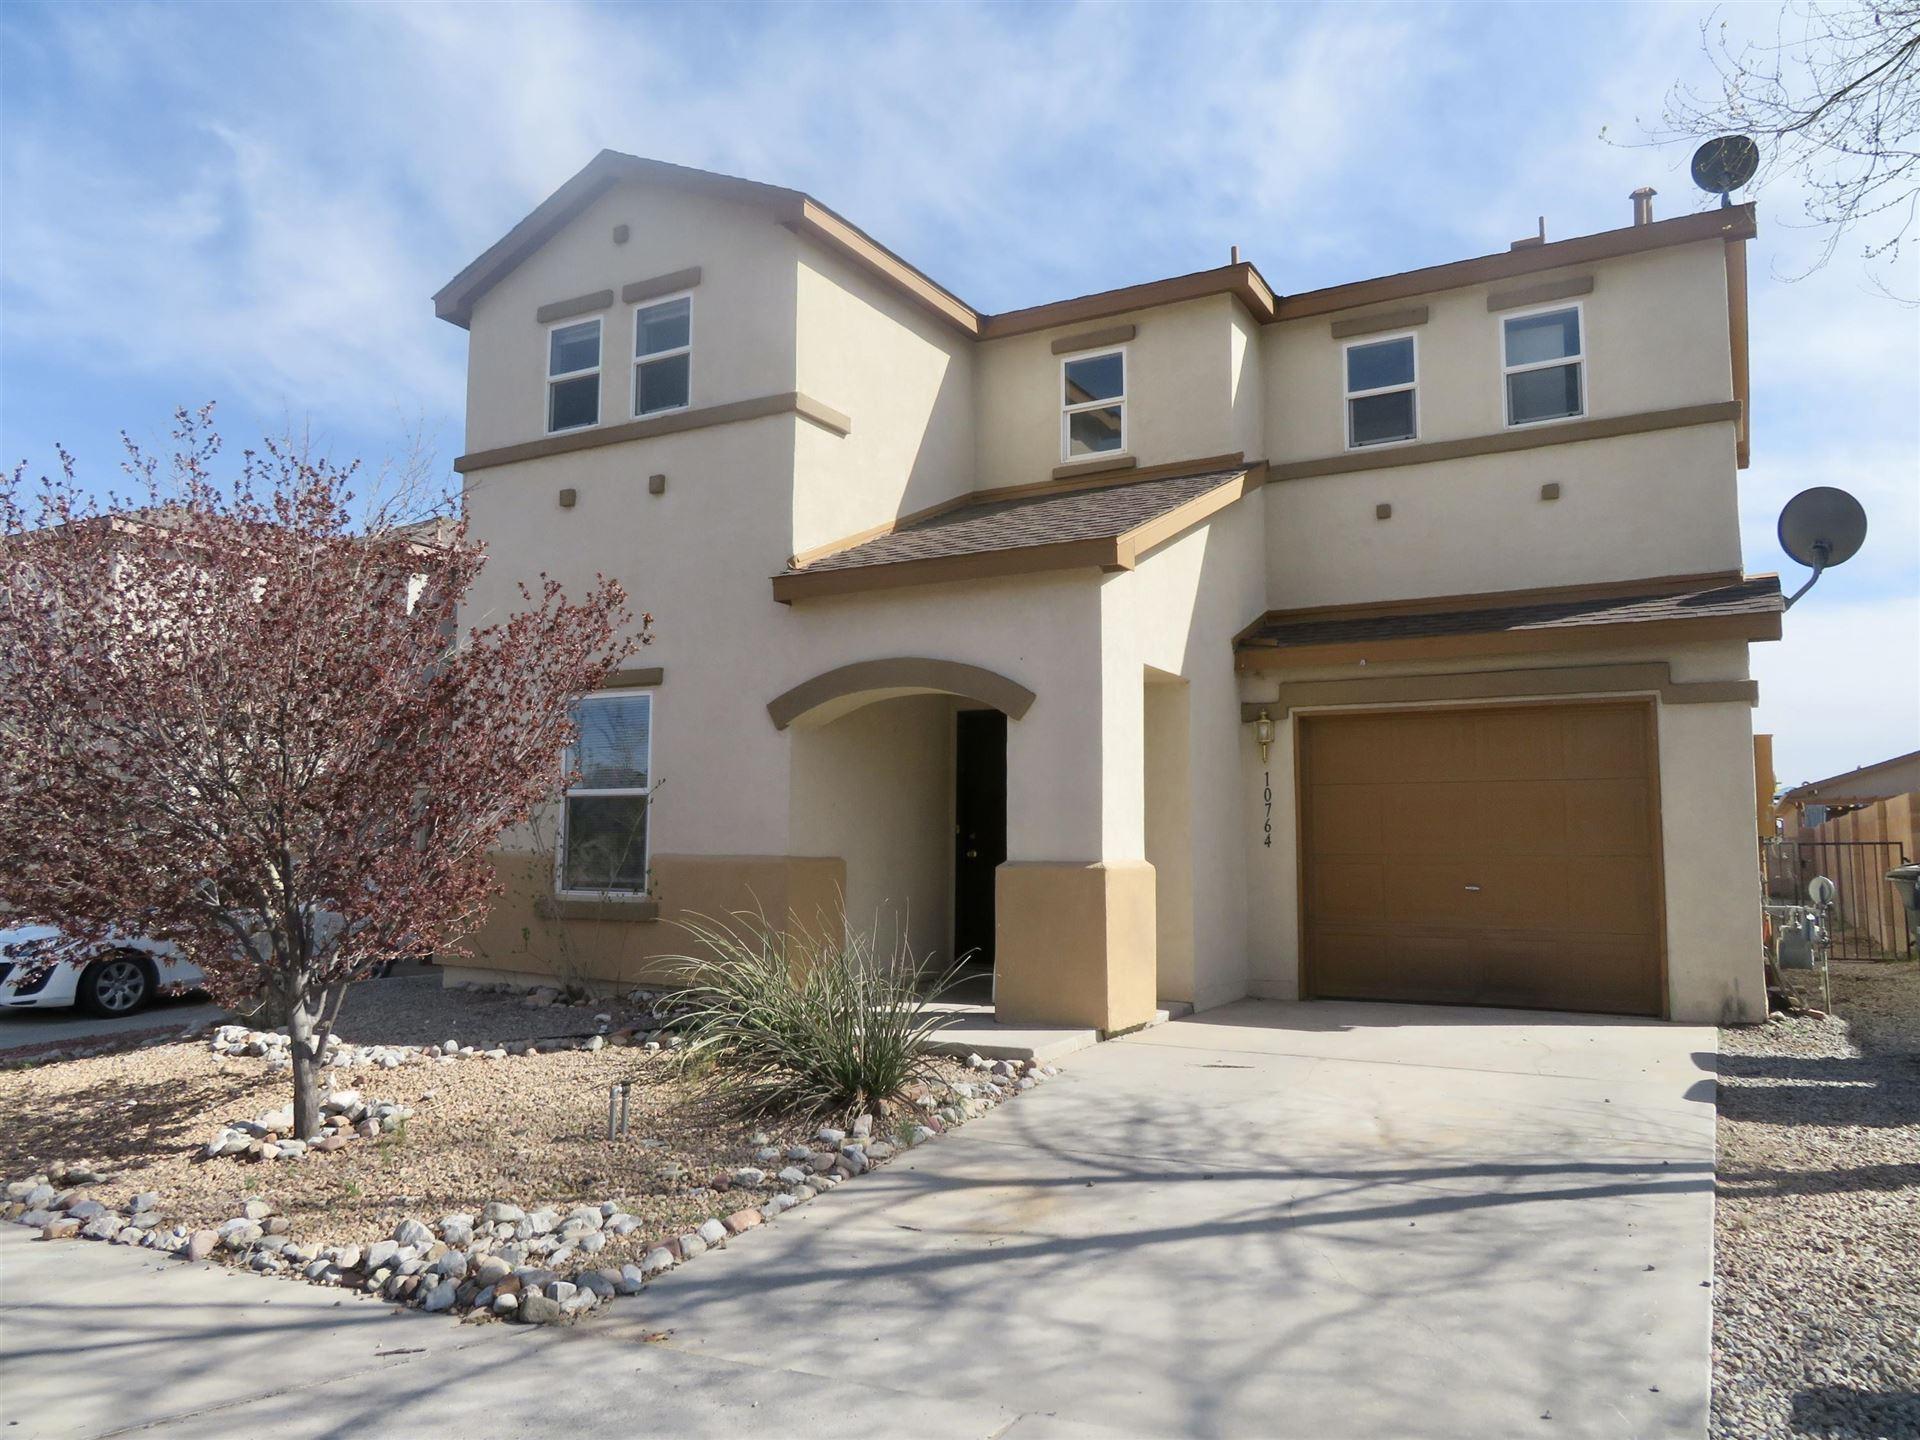 Photo of 10764 GENTRY Lane SW, Albuquerque, NM 87121 (MLS # 984119)